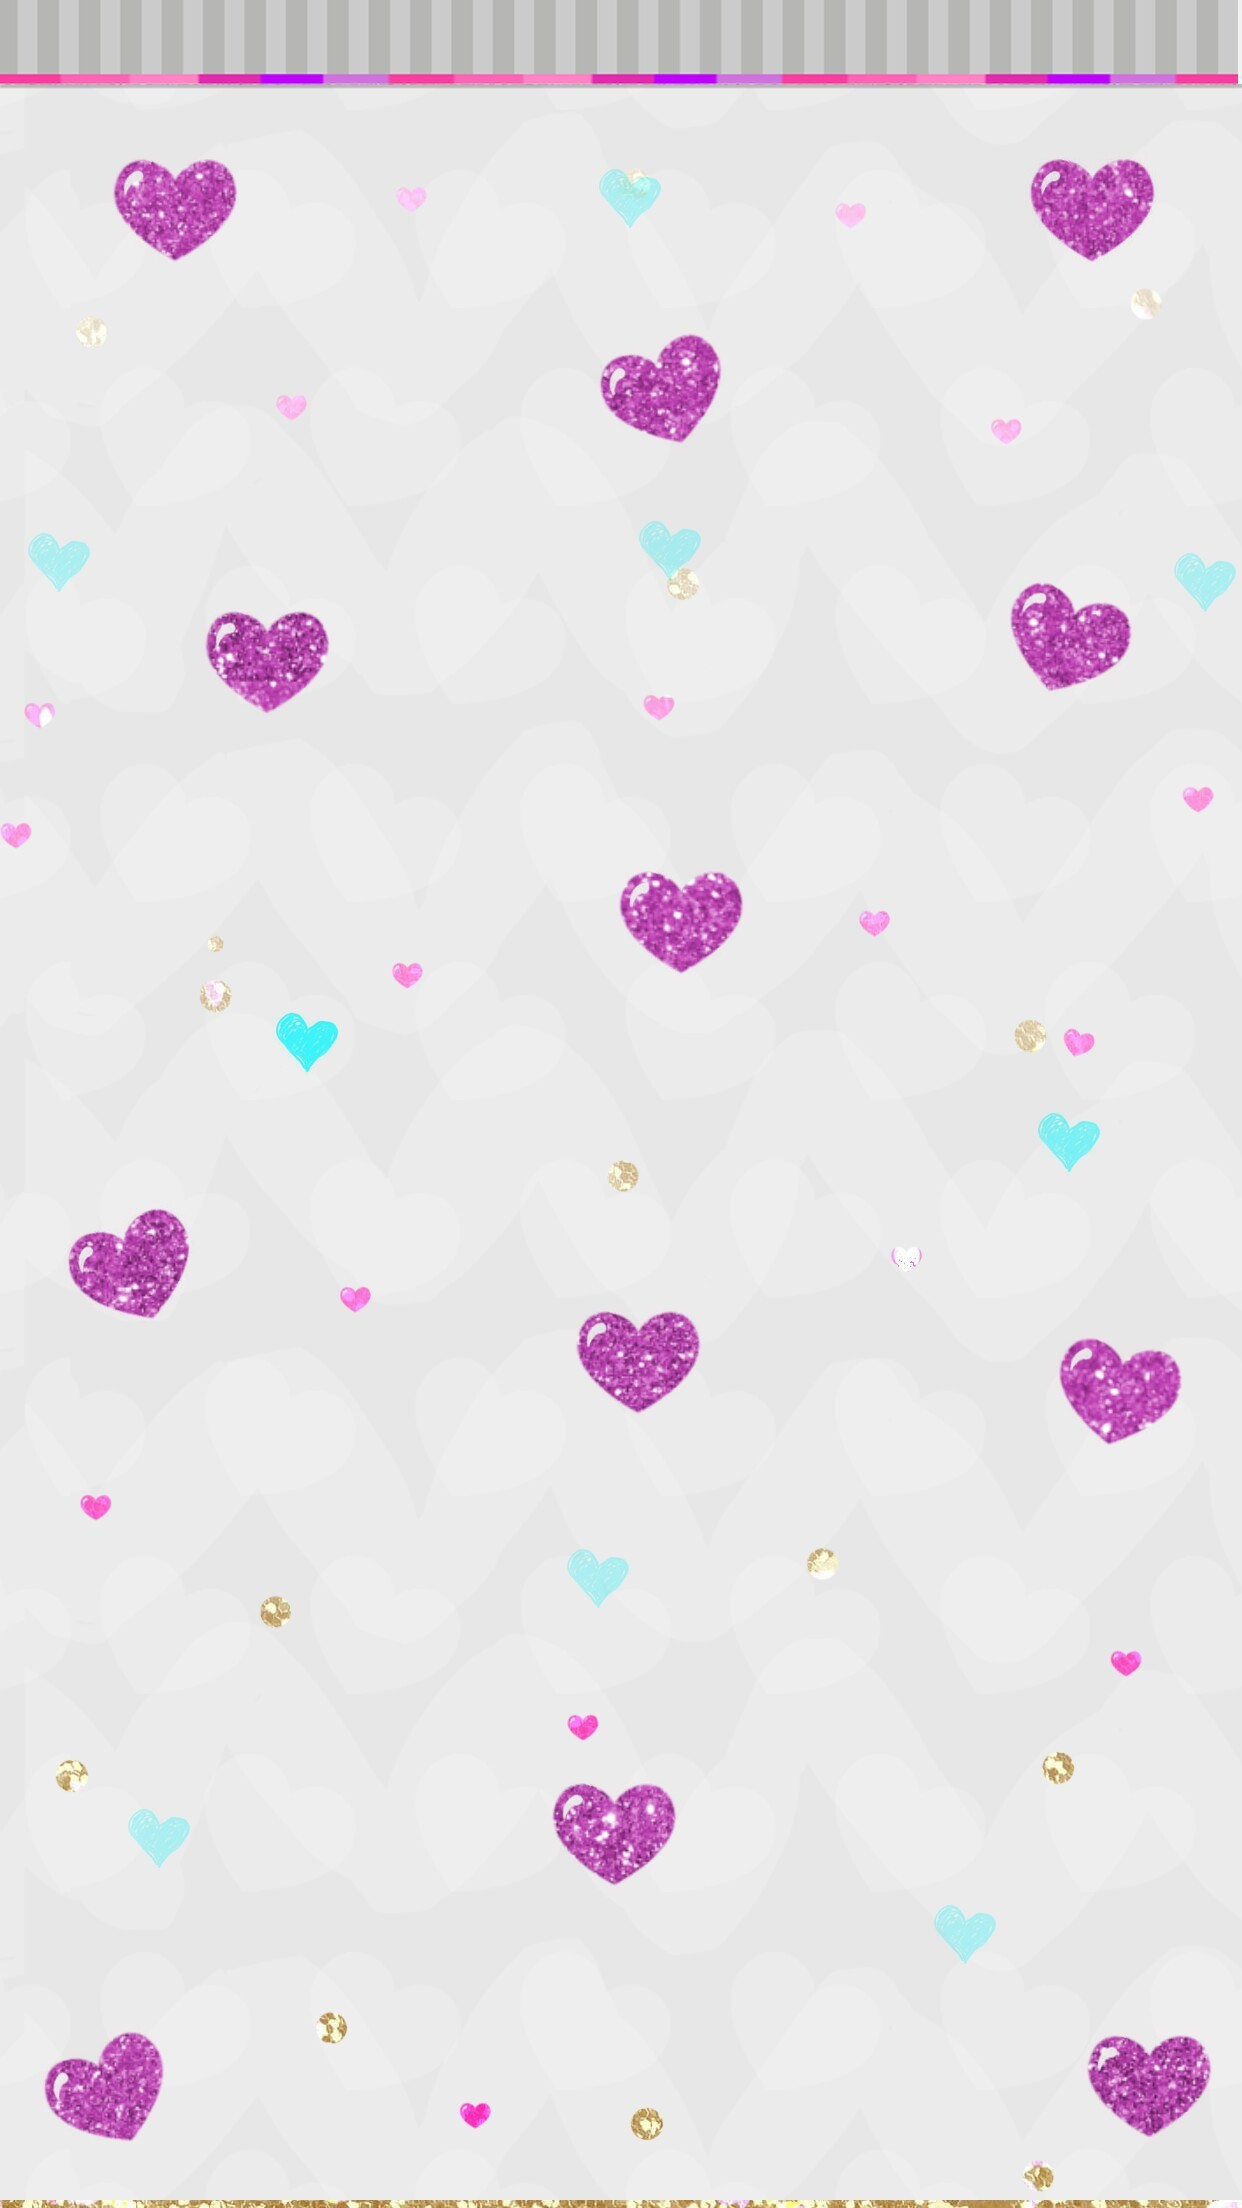 Amazing Wallpaper Hello Kitty Pattern - 963879-best-hello-kitty-valentines-wallpaper-1242x2208-full-hd  Pic_651882.jpg